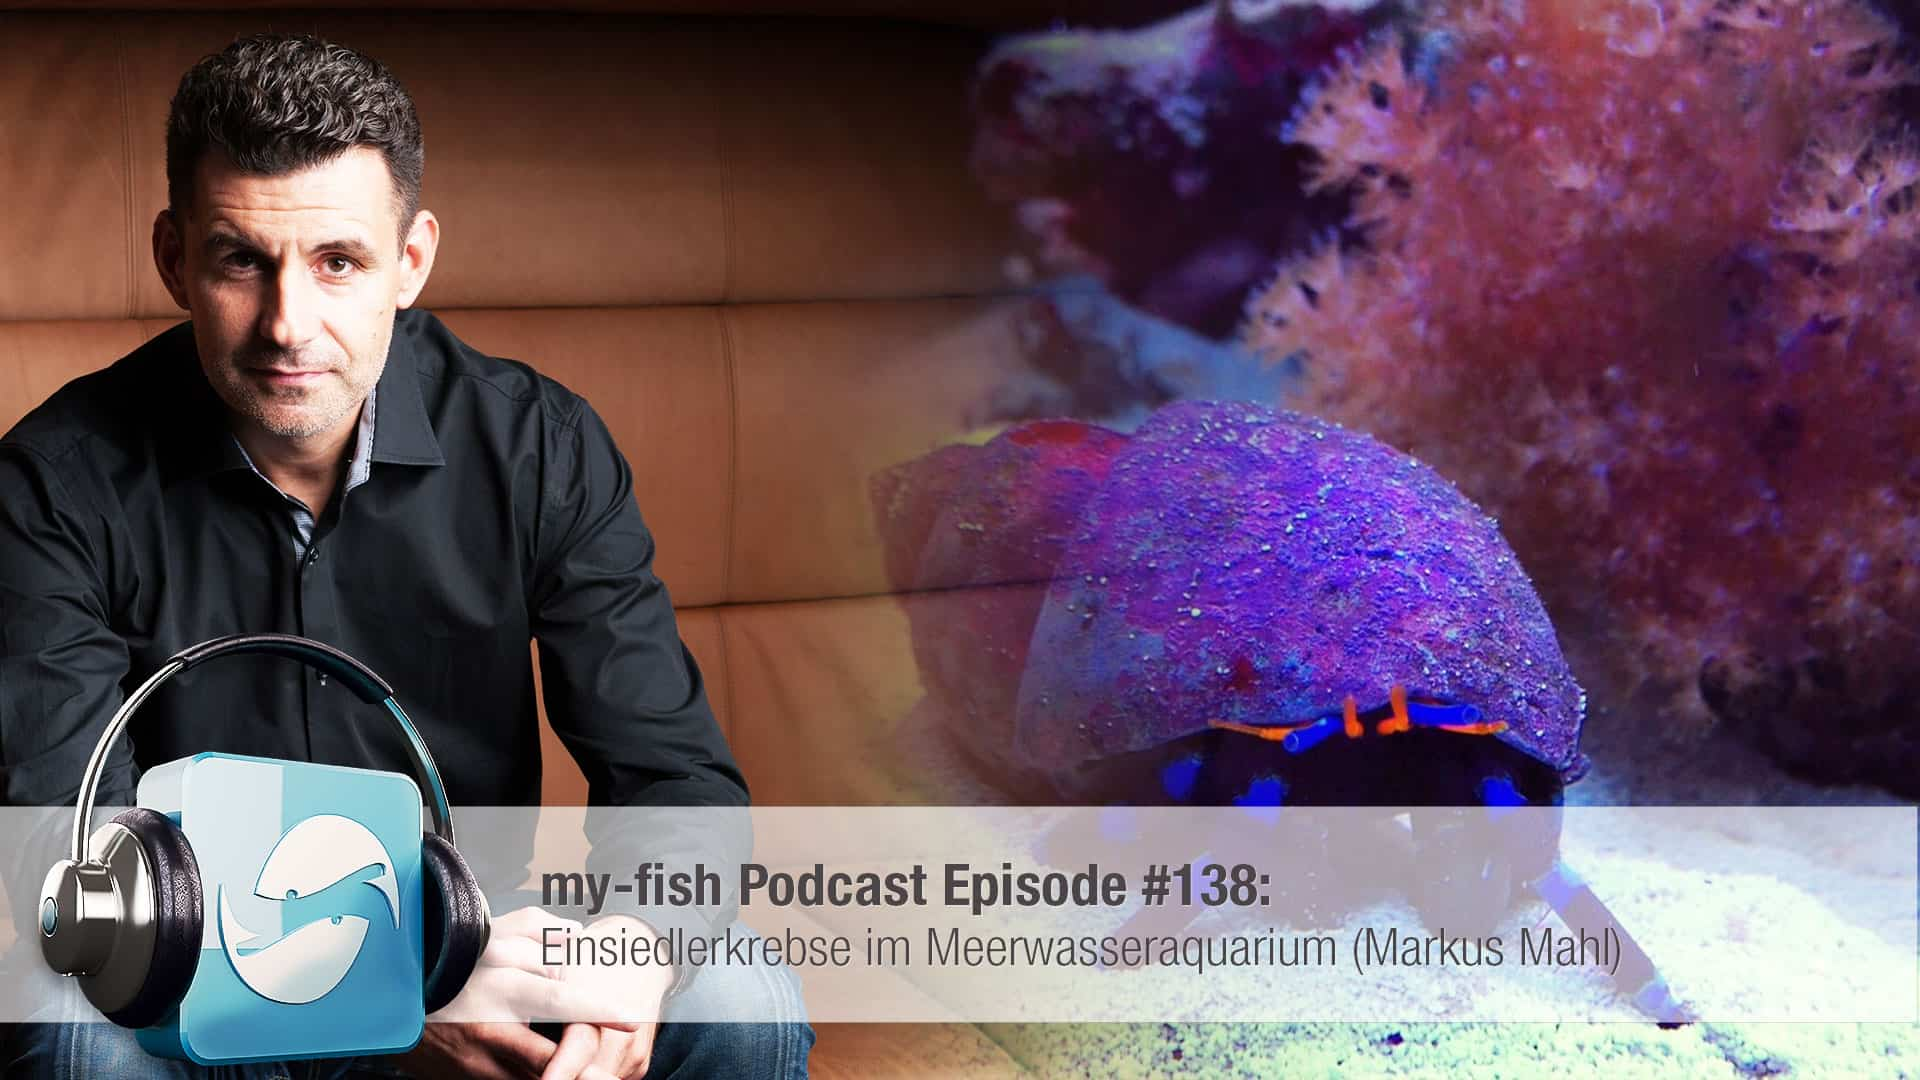 Podcast Episode #138: Einsiedlerkrebse im Meerwasseraquarium (Markus Mahl) 1